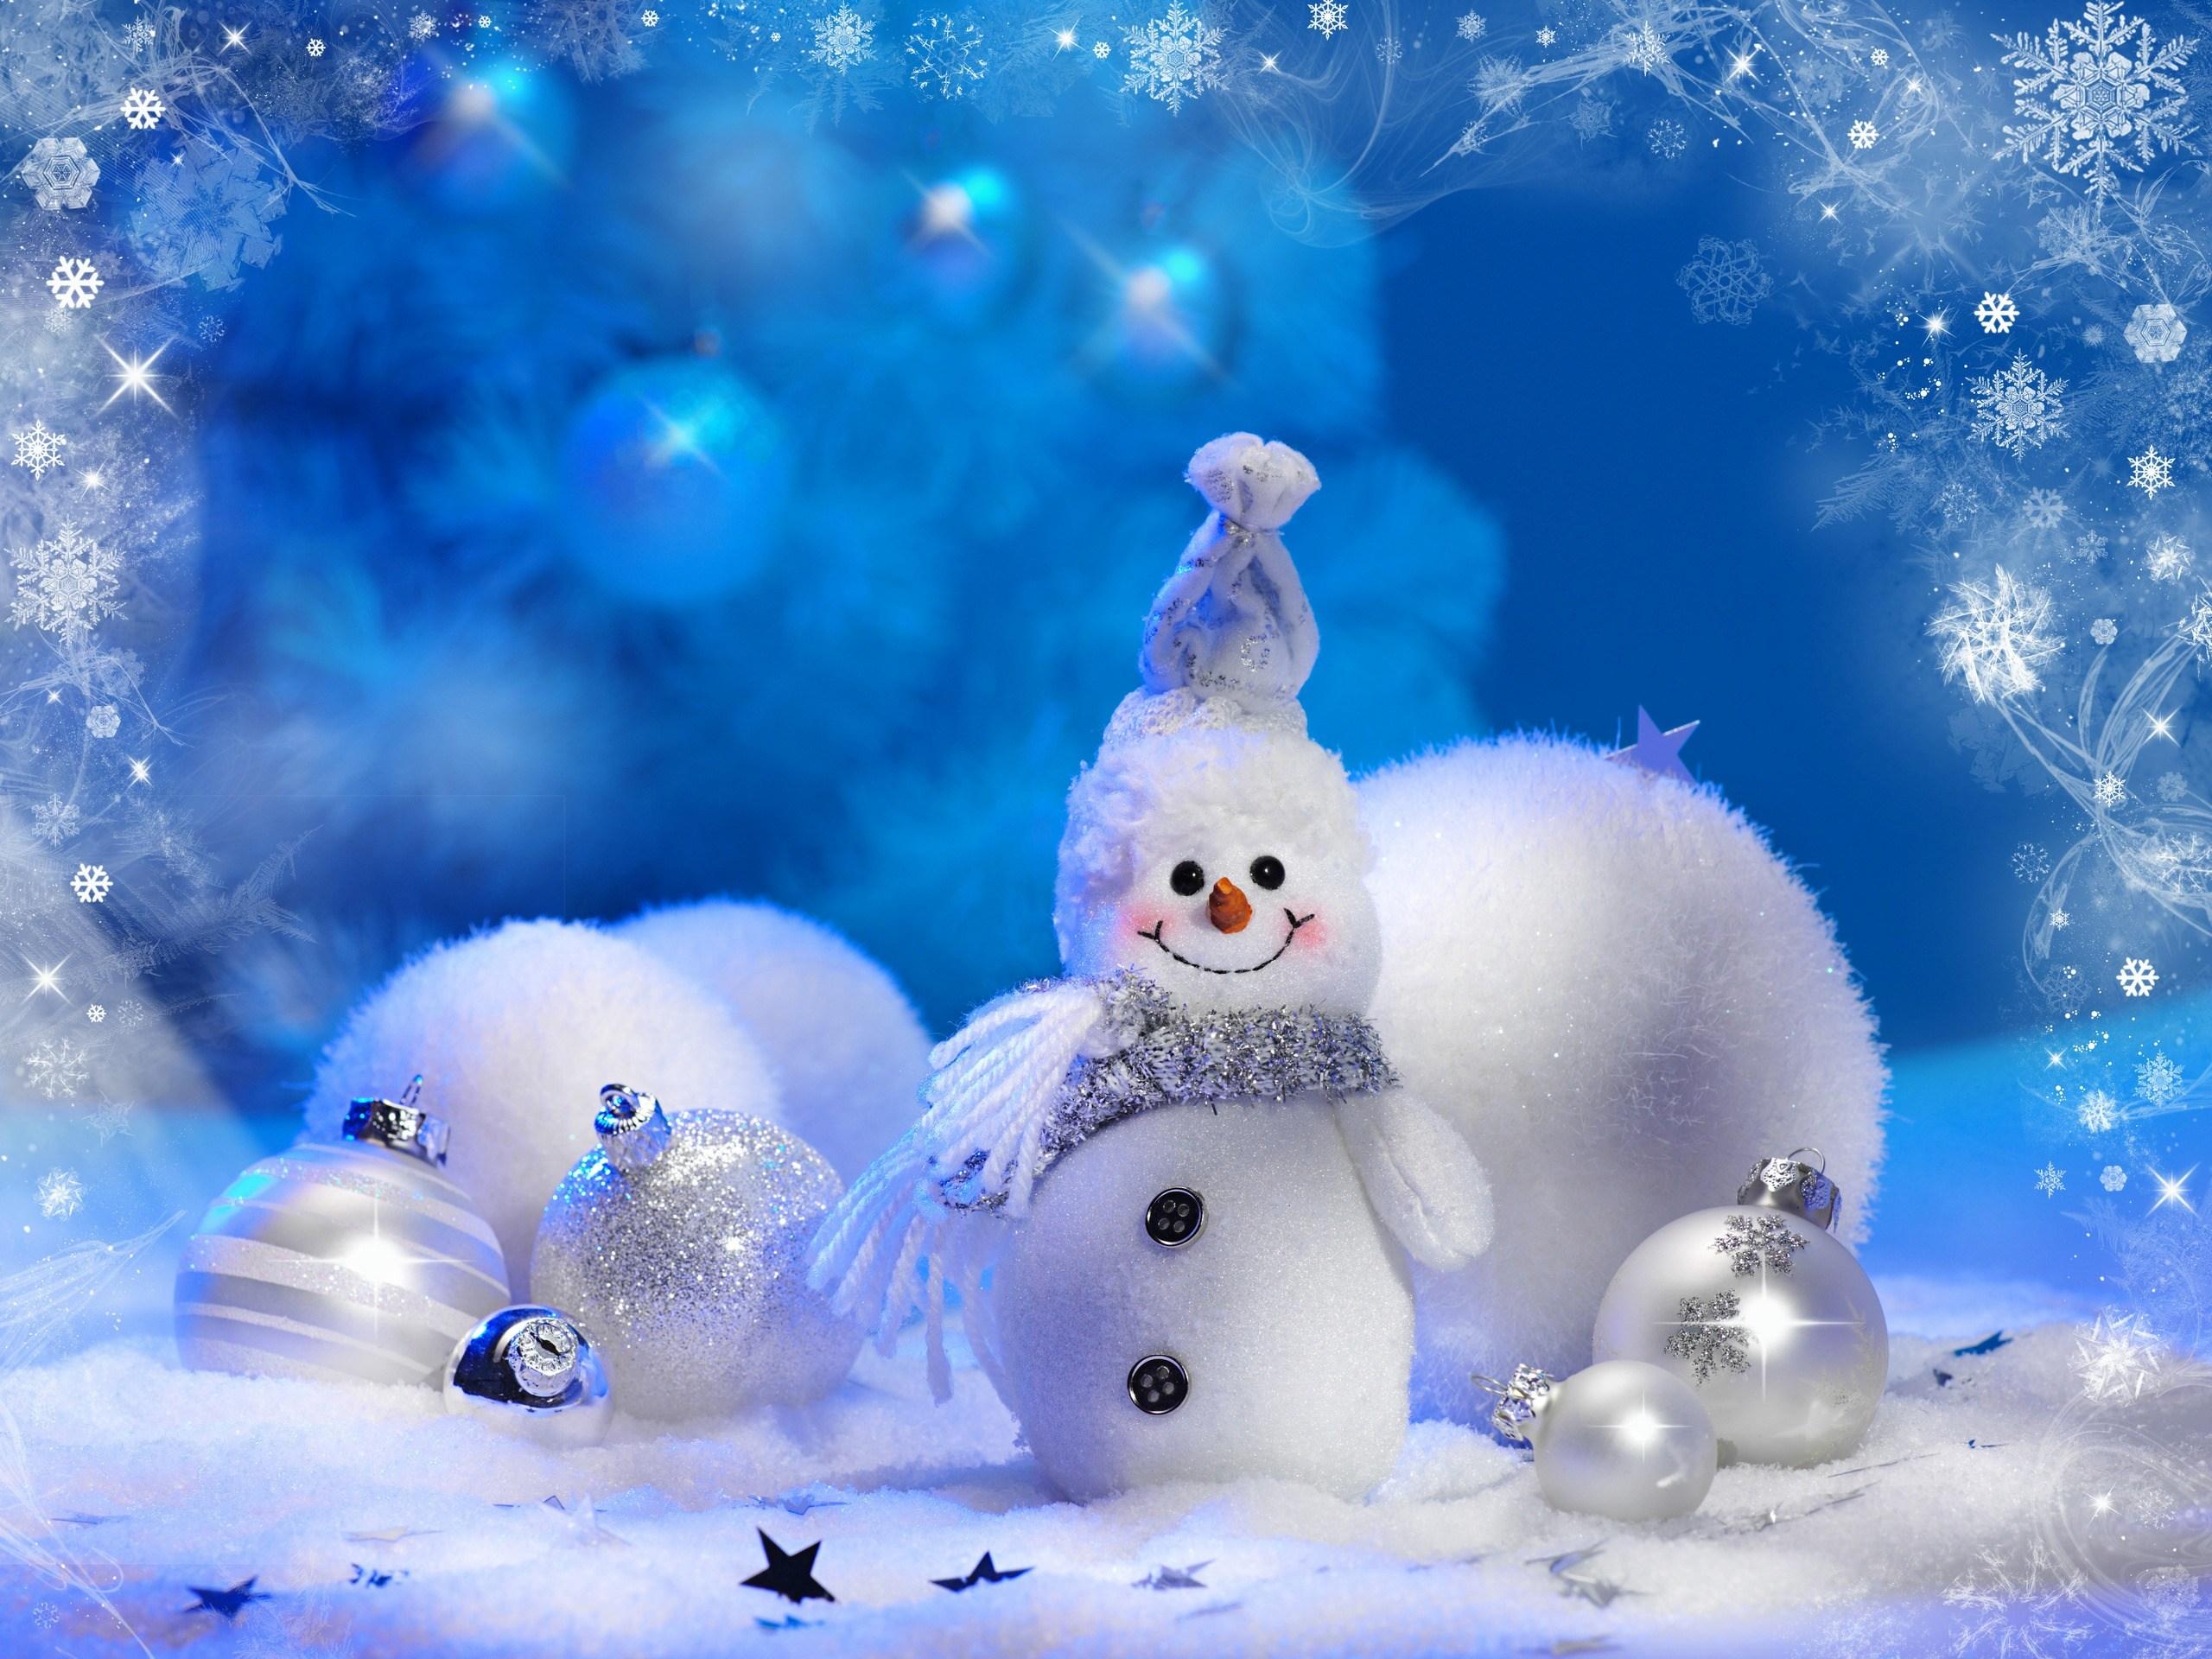 Image gallery neige noel - Bonhomme de neige decoration exterieure ...